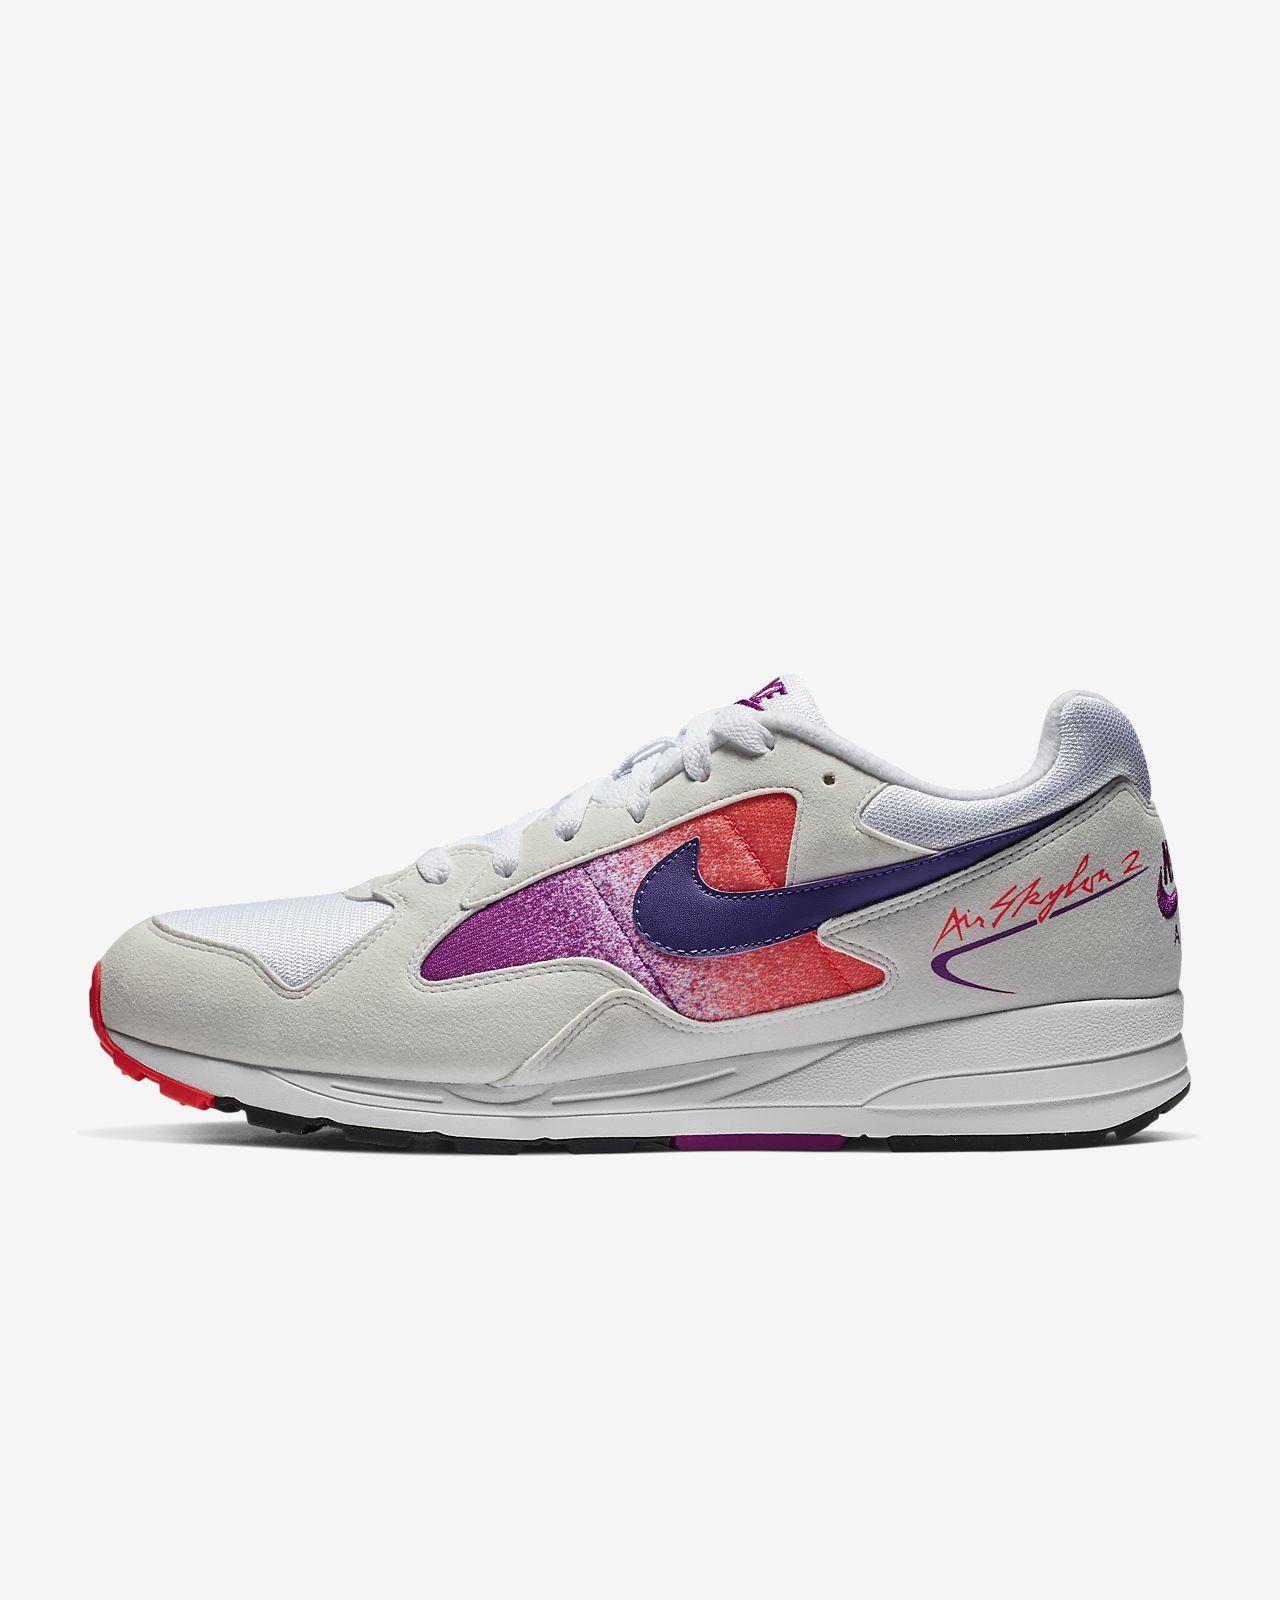 herreNO Air sko til II Nike Skylon wkXPn0O8